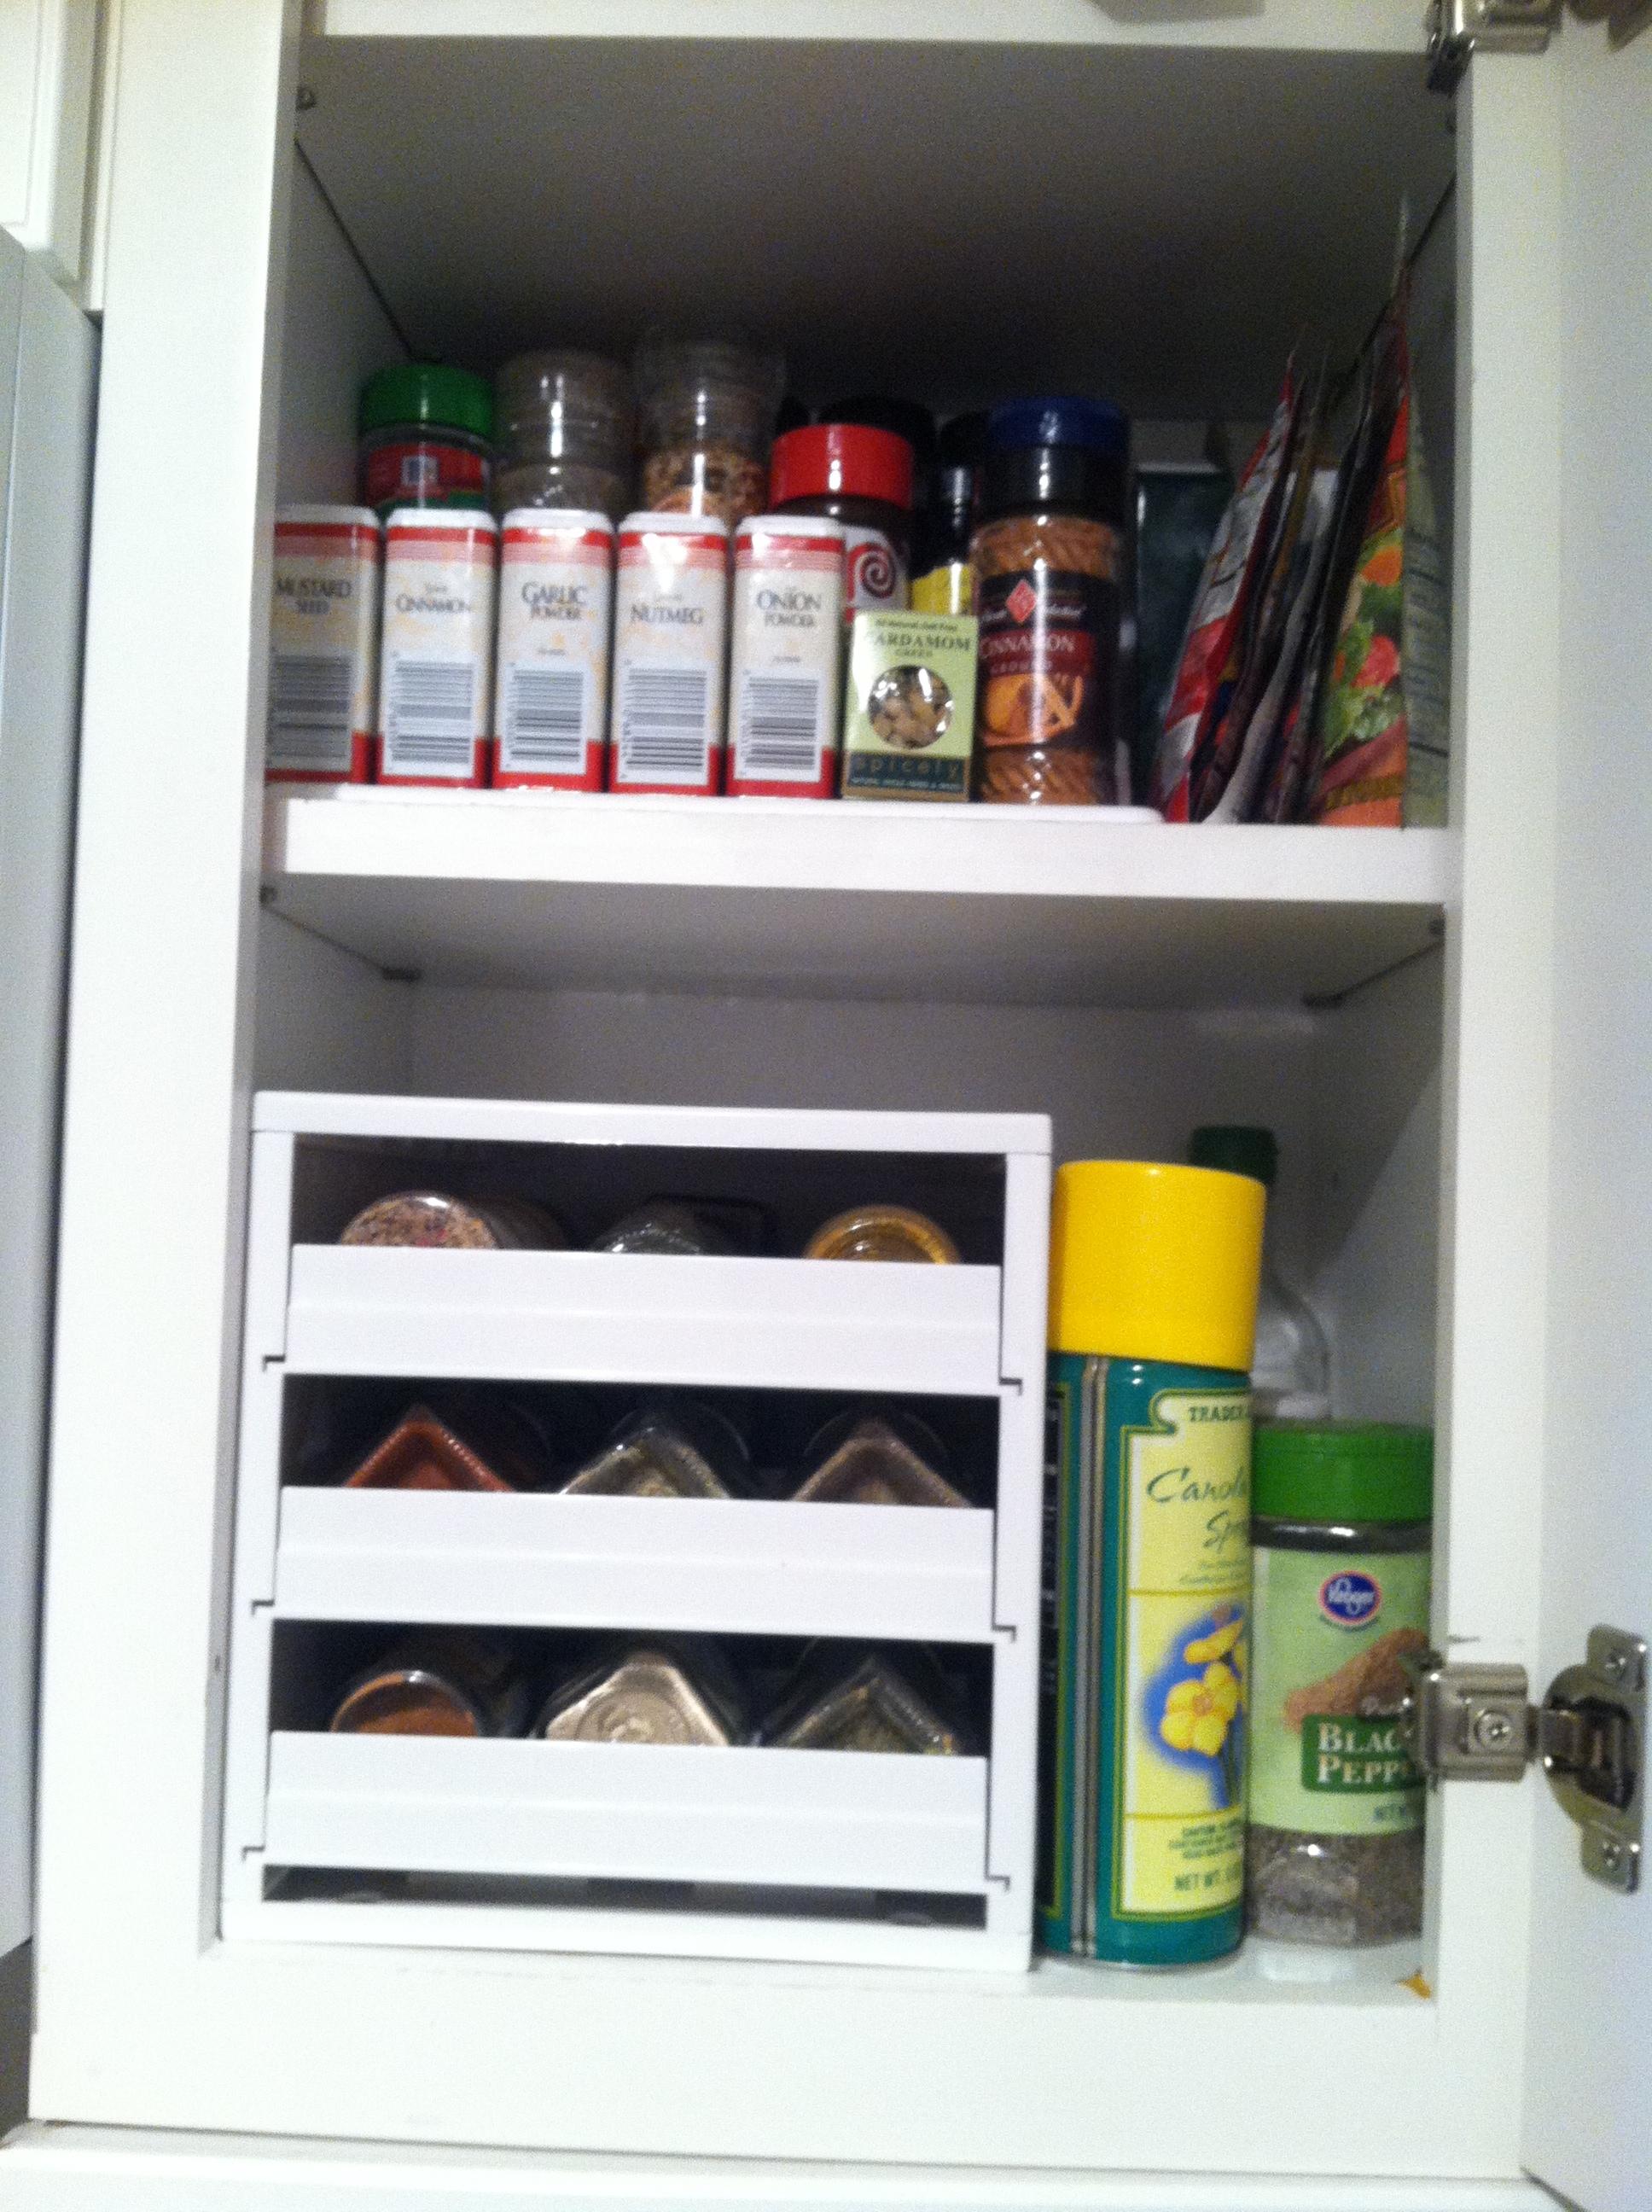 My newly organized spice shelves.